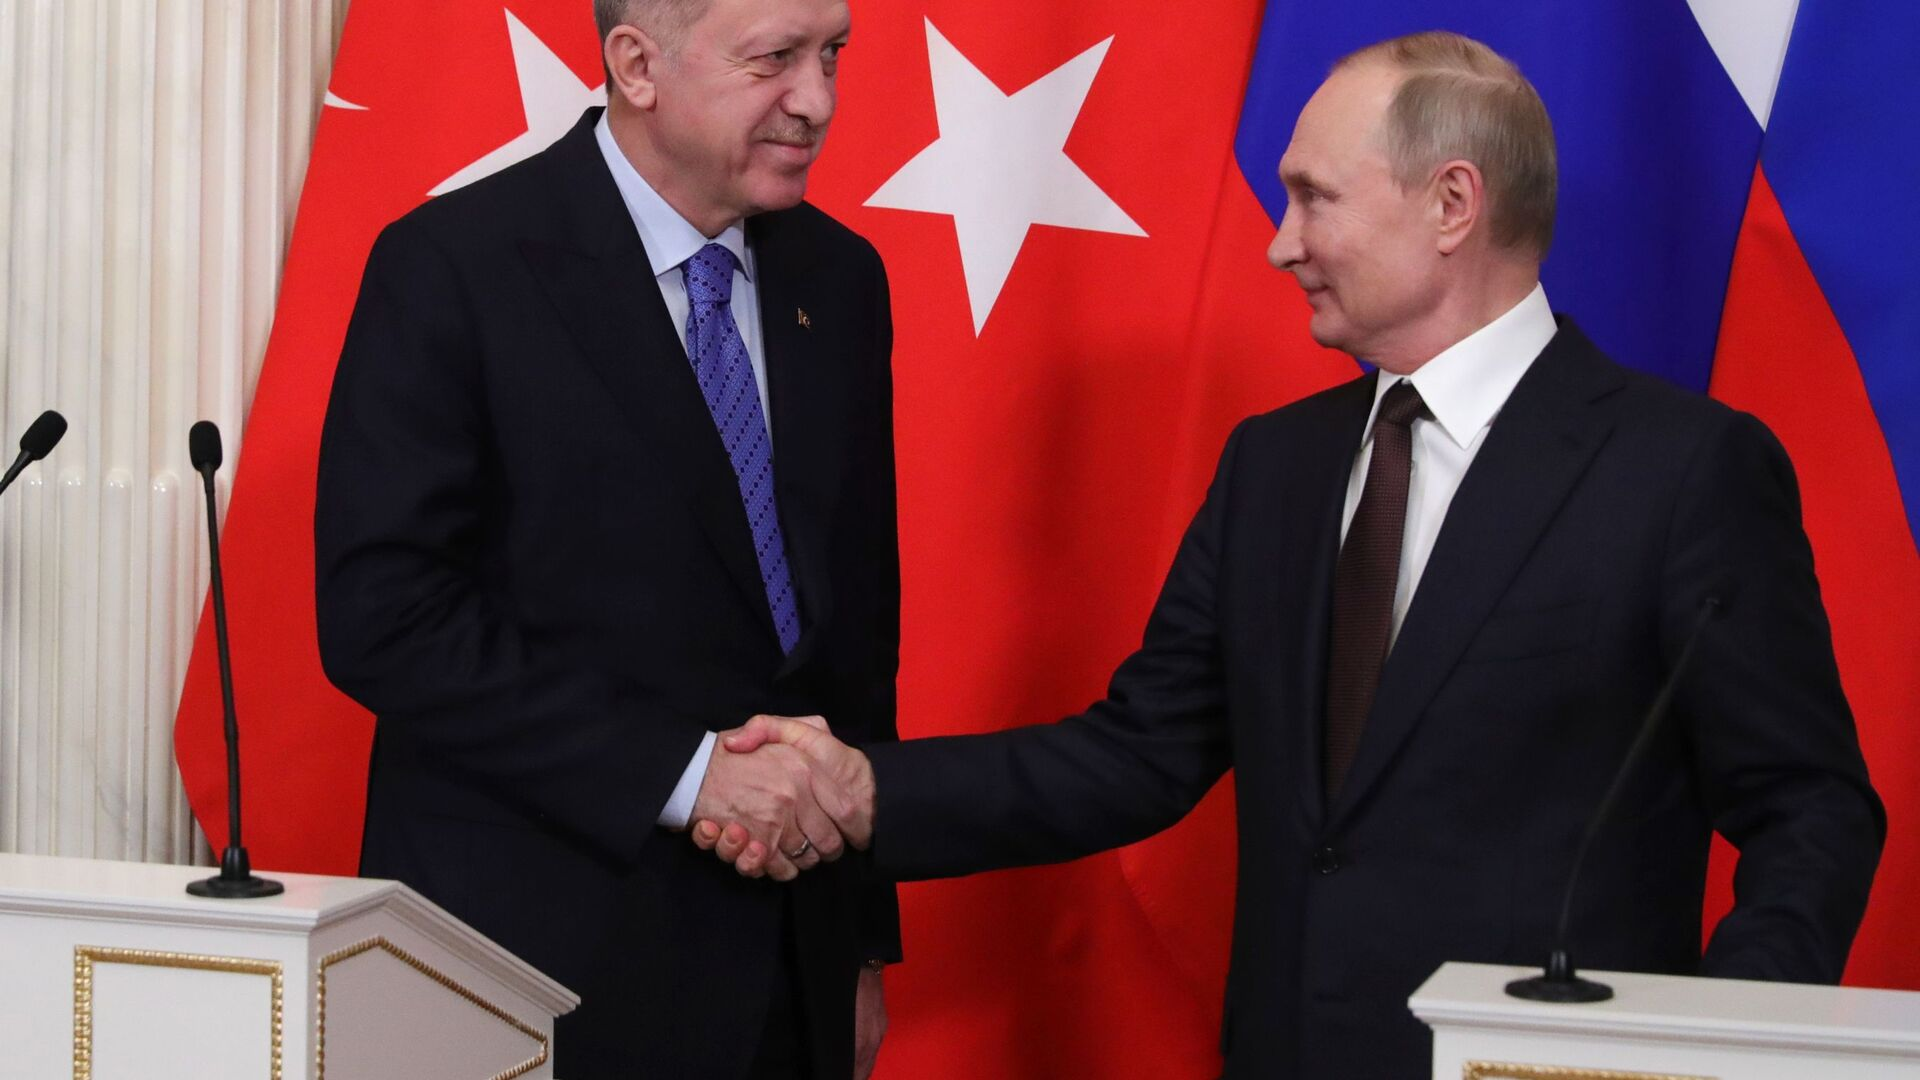 Президент РФ Владимир Путин и президент Турции Реджеп Тайип Эрдоган ( слева) - Sputnik Azərbaycan, 1920, 21.09.2021